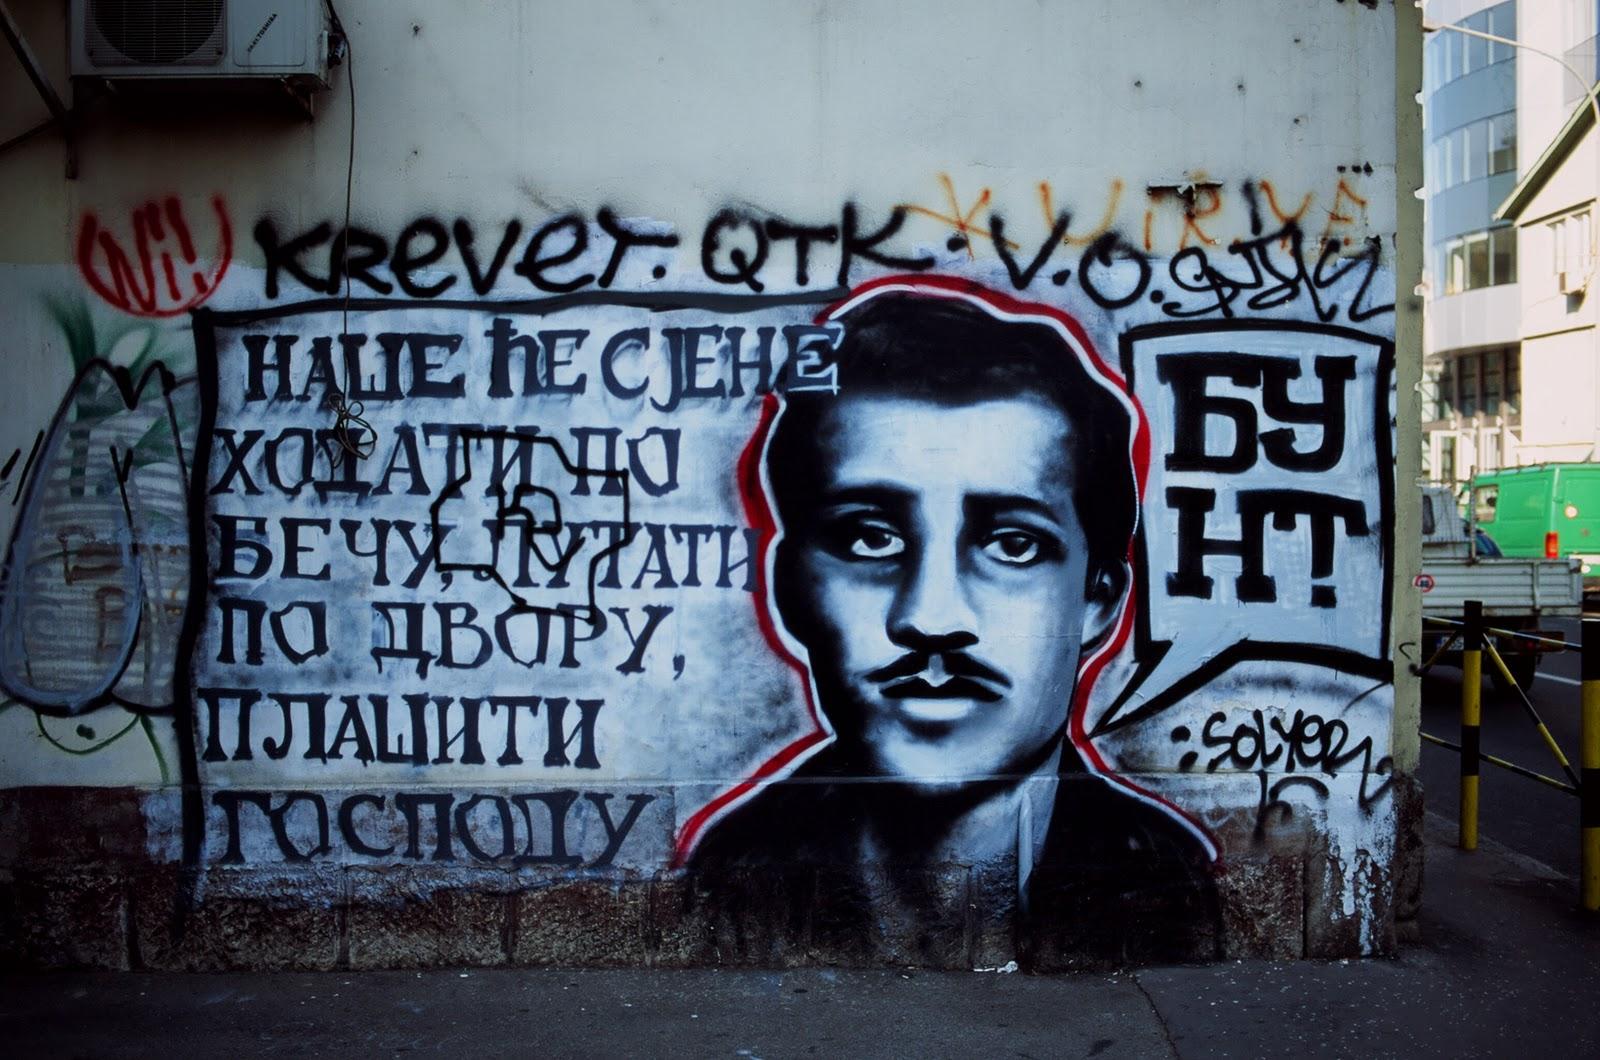 Графит Гаврила Принципа, Београд, улица Гаврила Принципа, аутор: БУНТ!